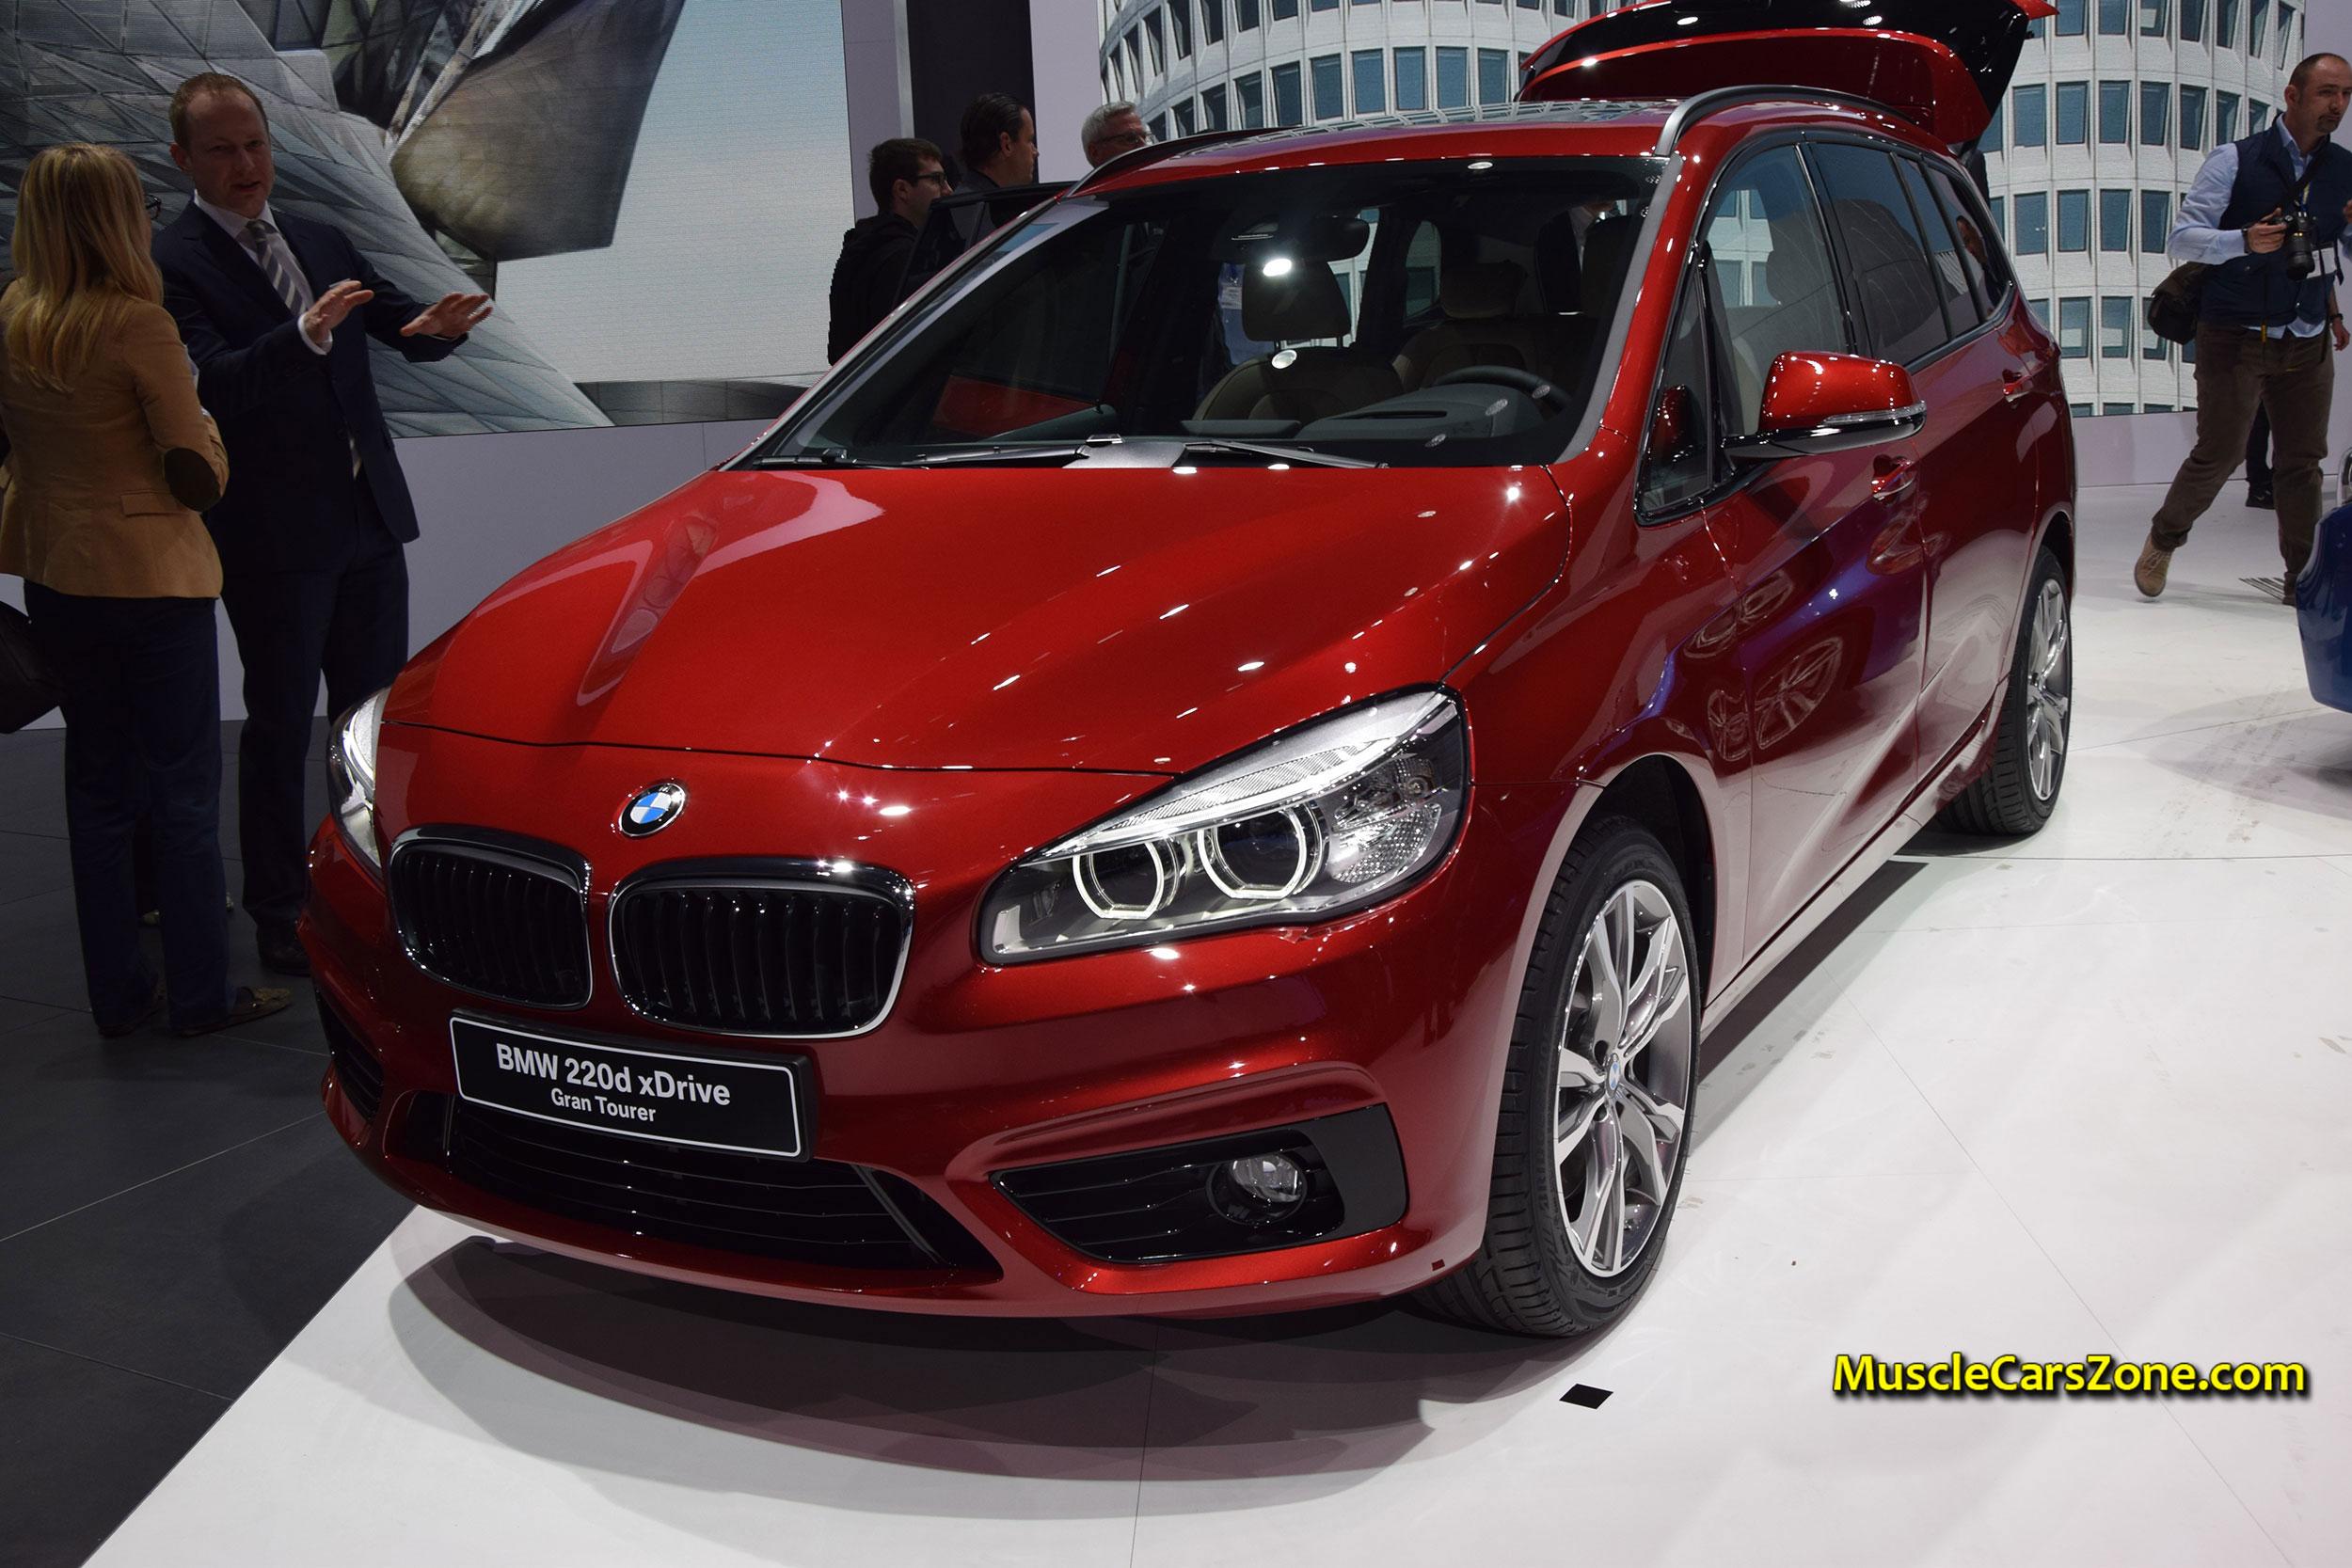 2015-BMW-2-Series-220d-xDrive-Gran-Tourer-03---Minivan---2015-Geneva-Motor-Show